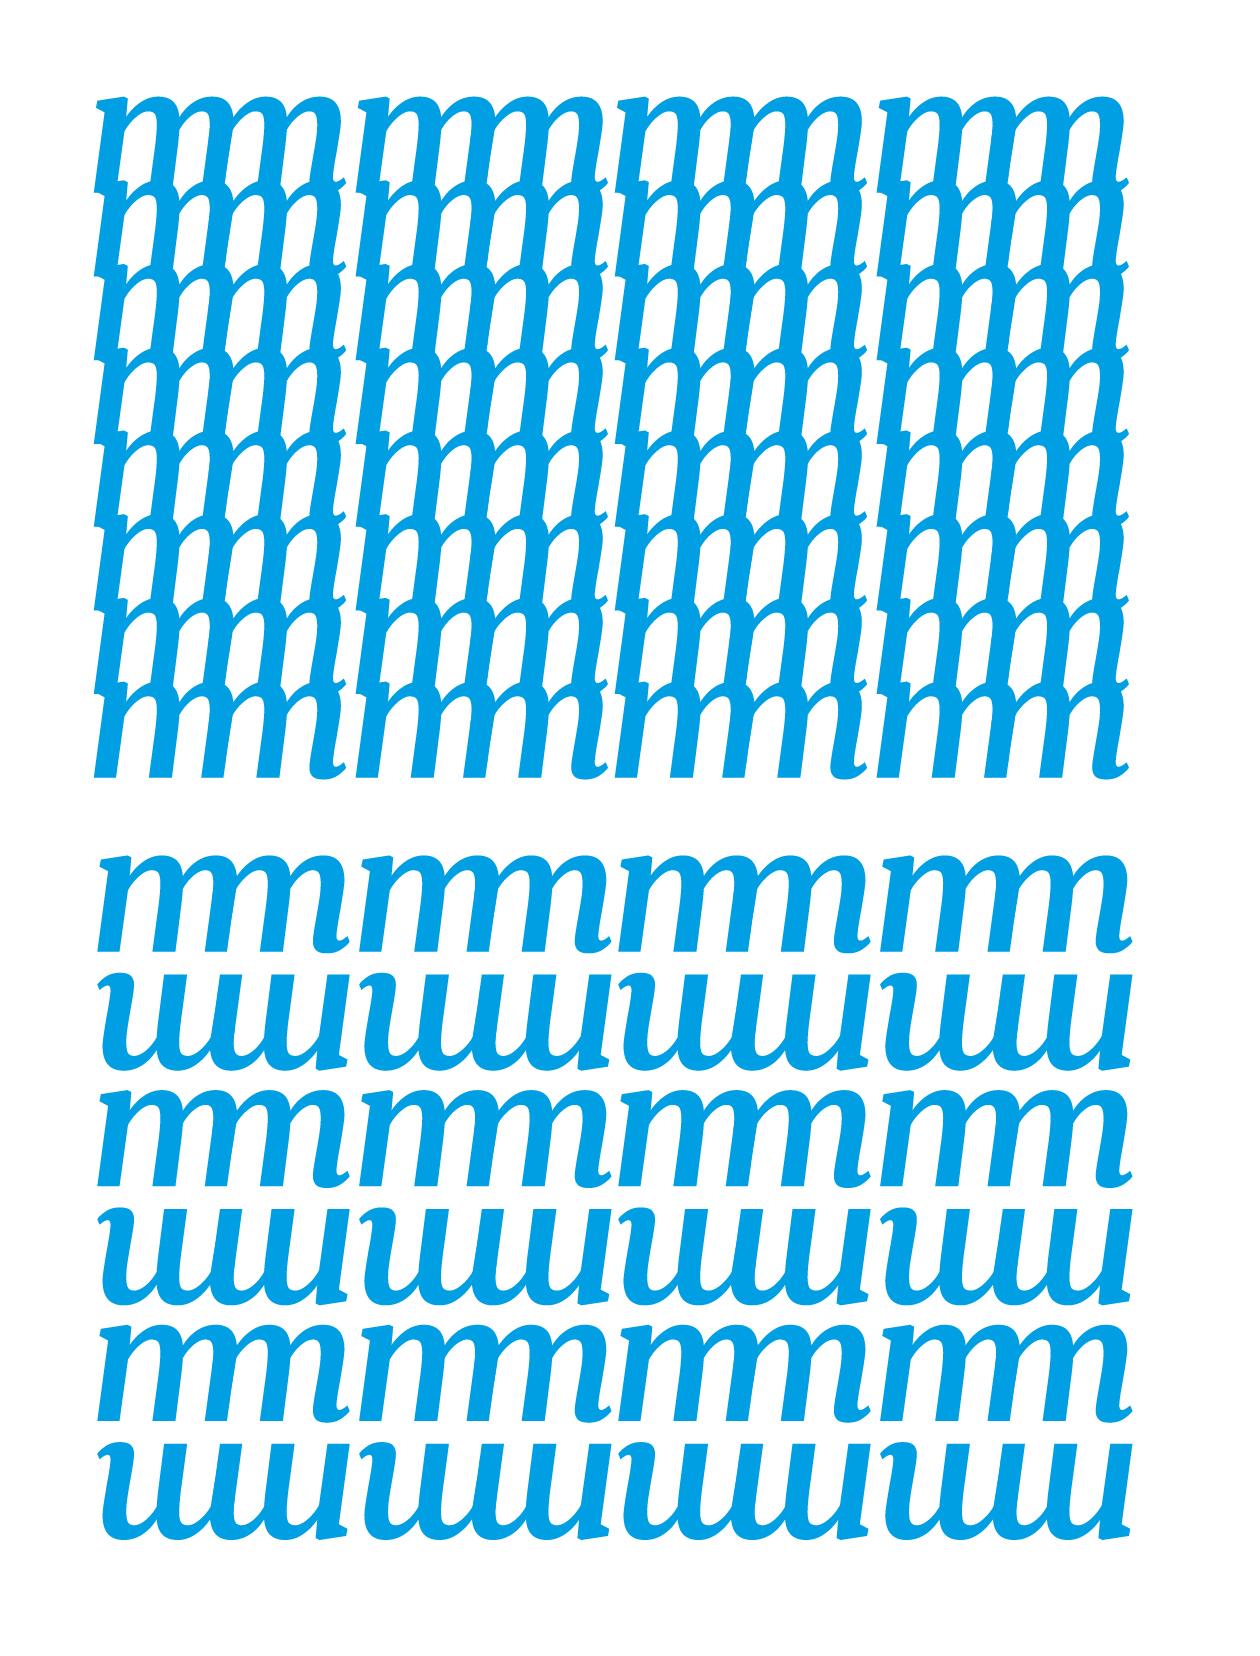 Логотип для  детского бассейна. фото f_6975c75fed840fba.jpg